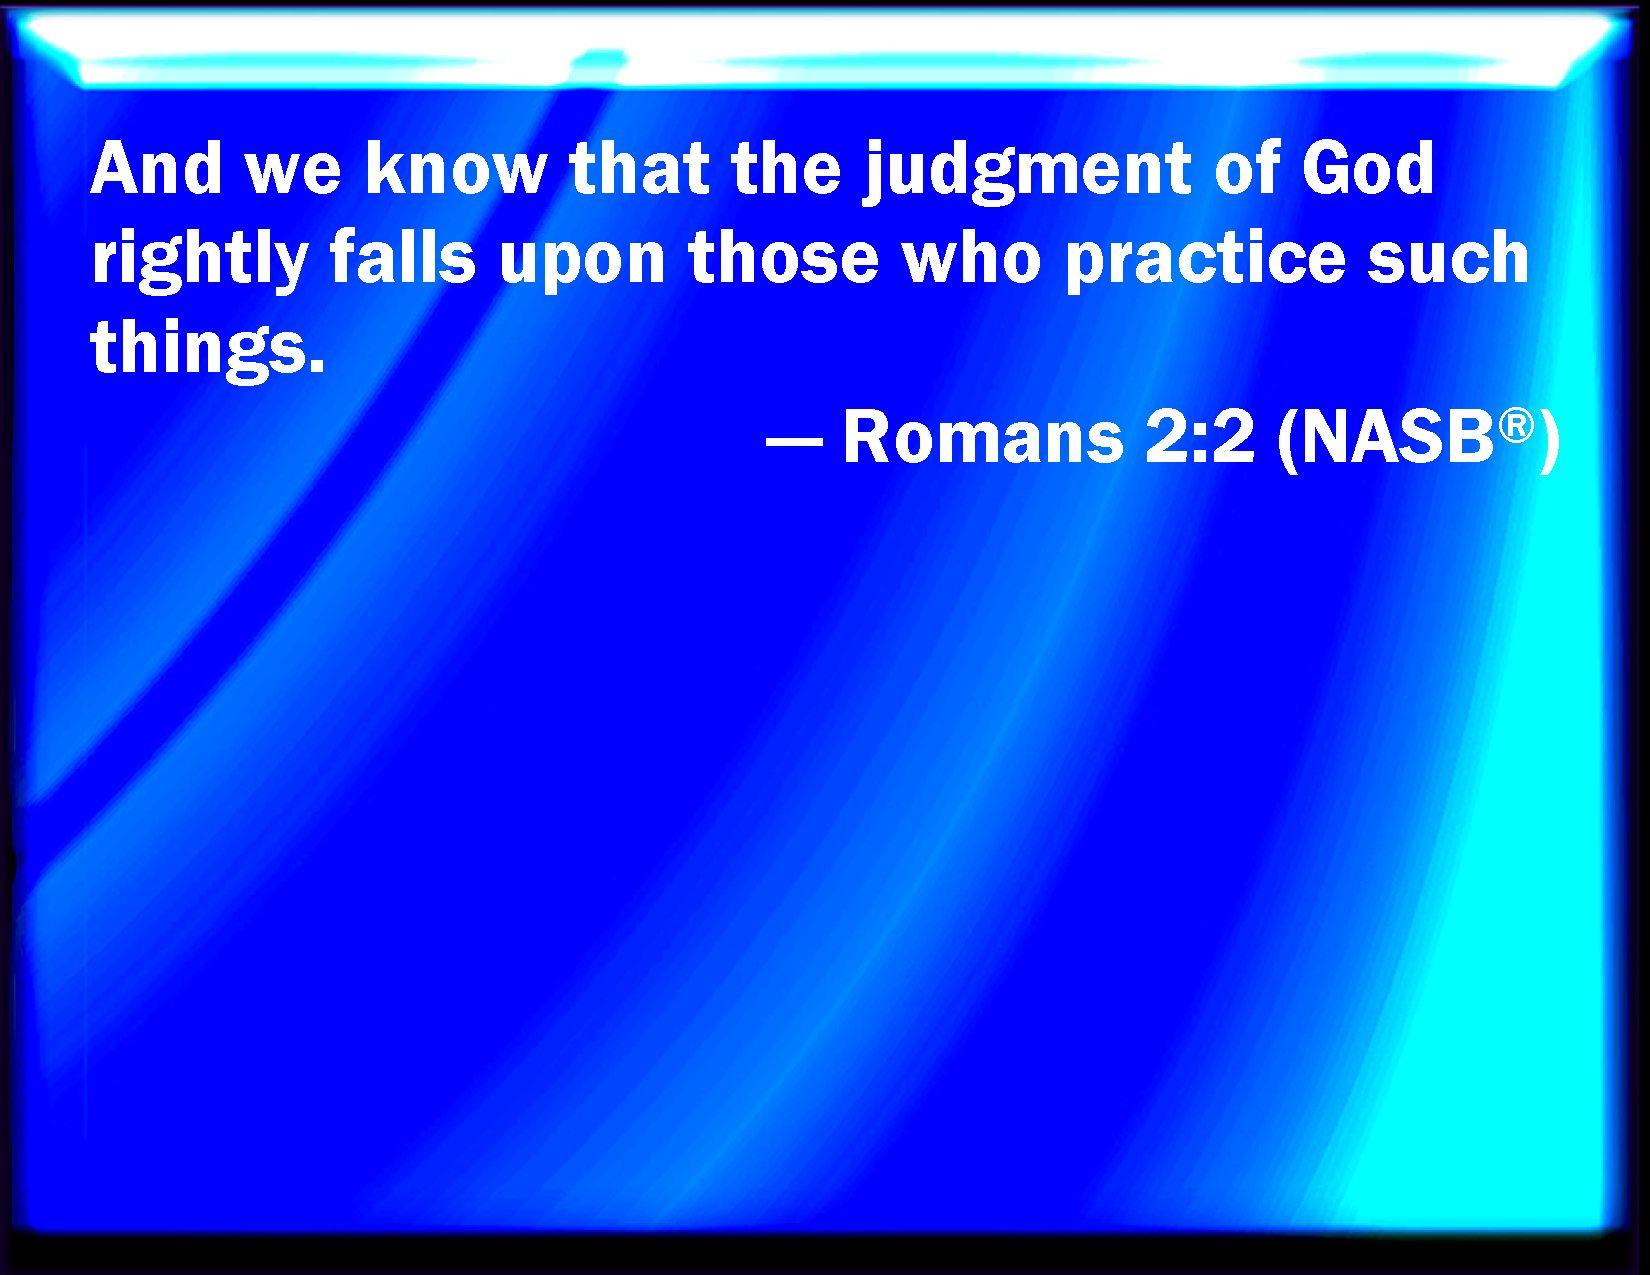 Romans 2:2